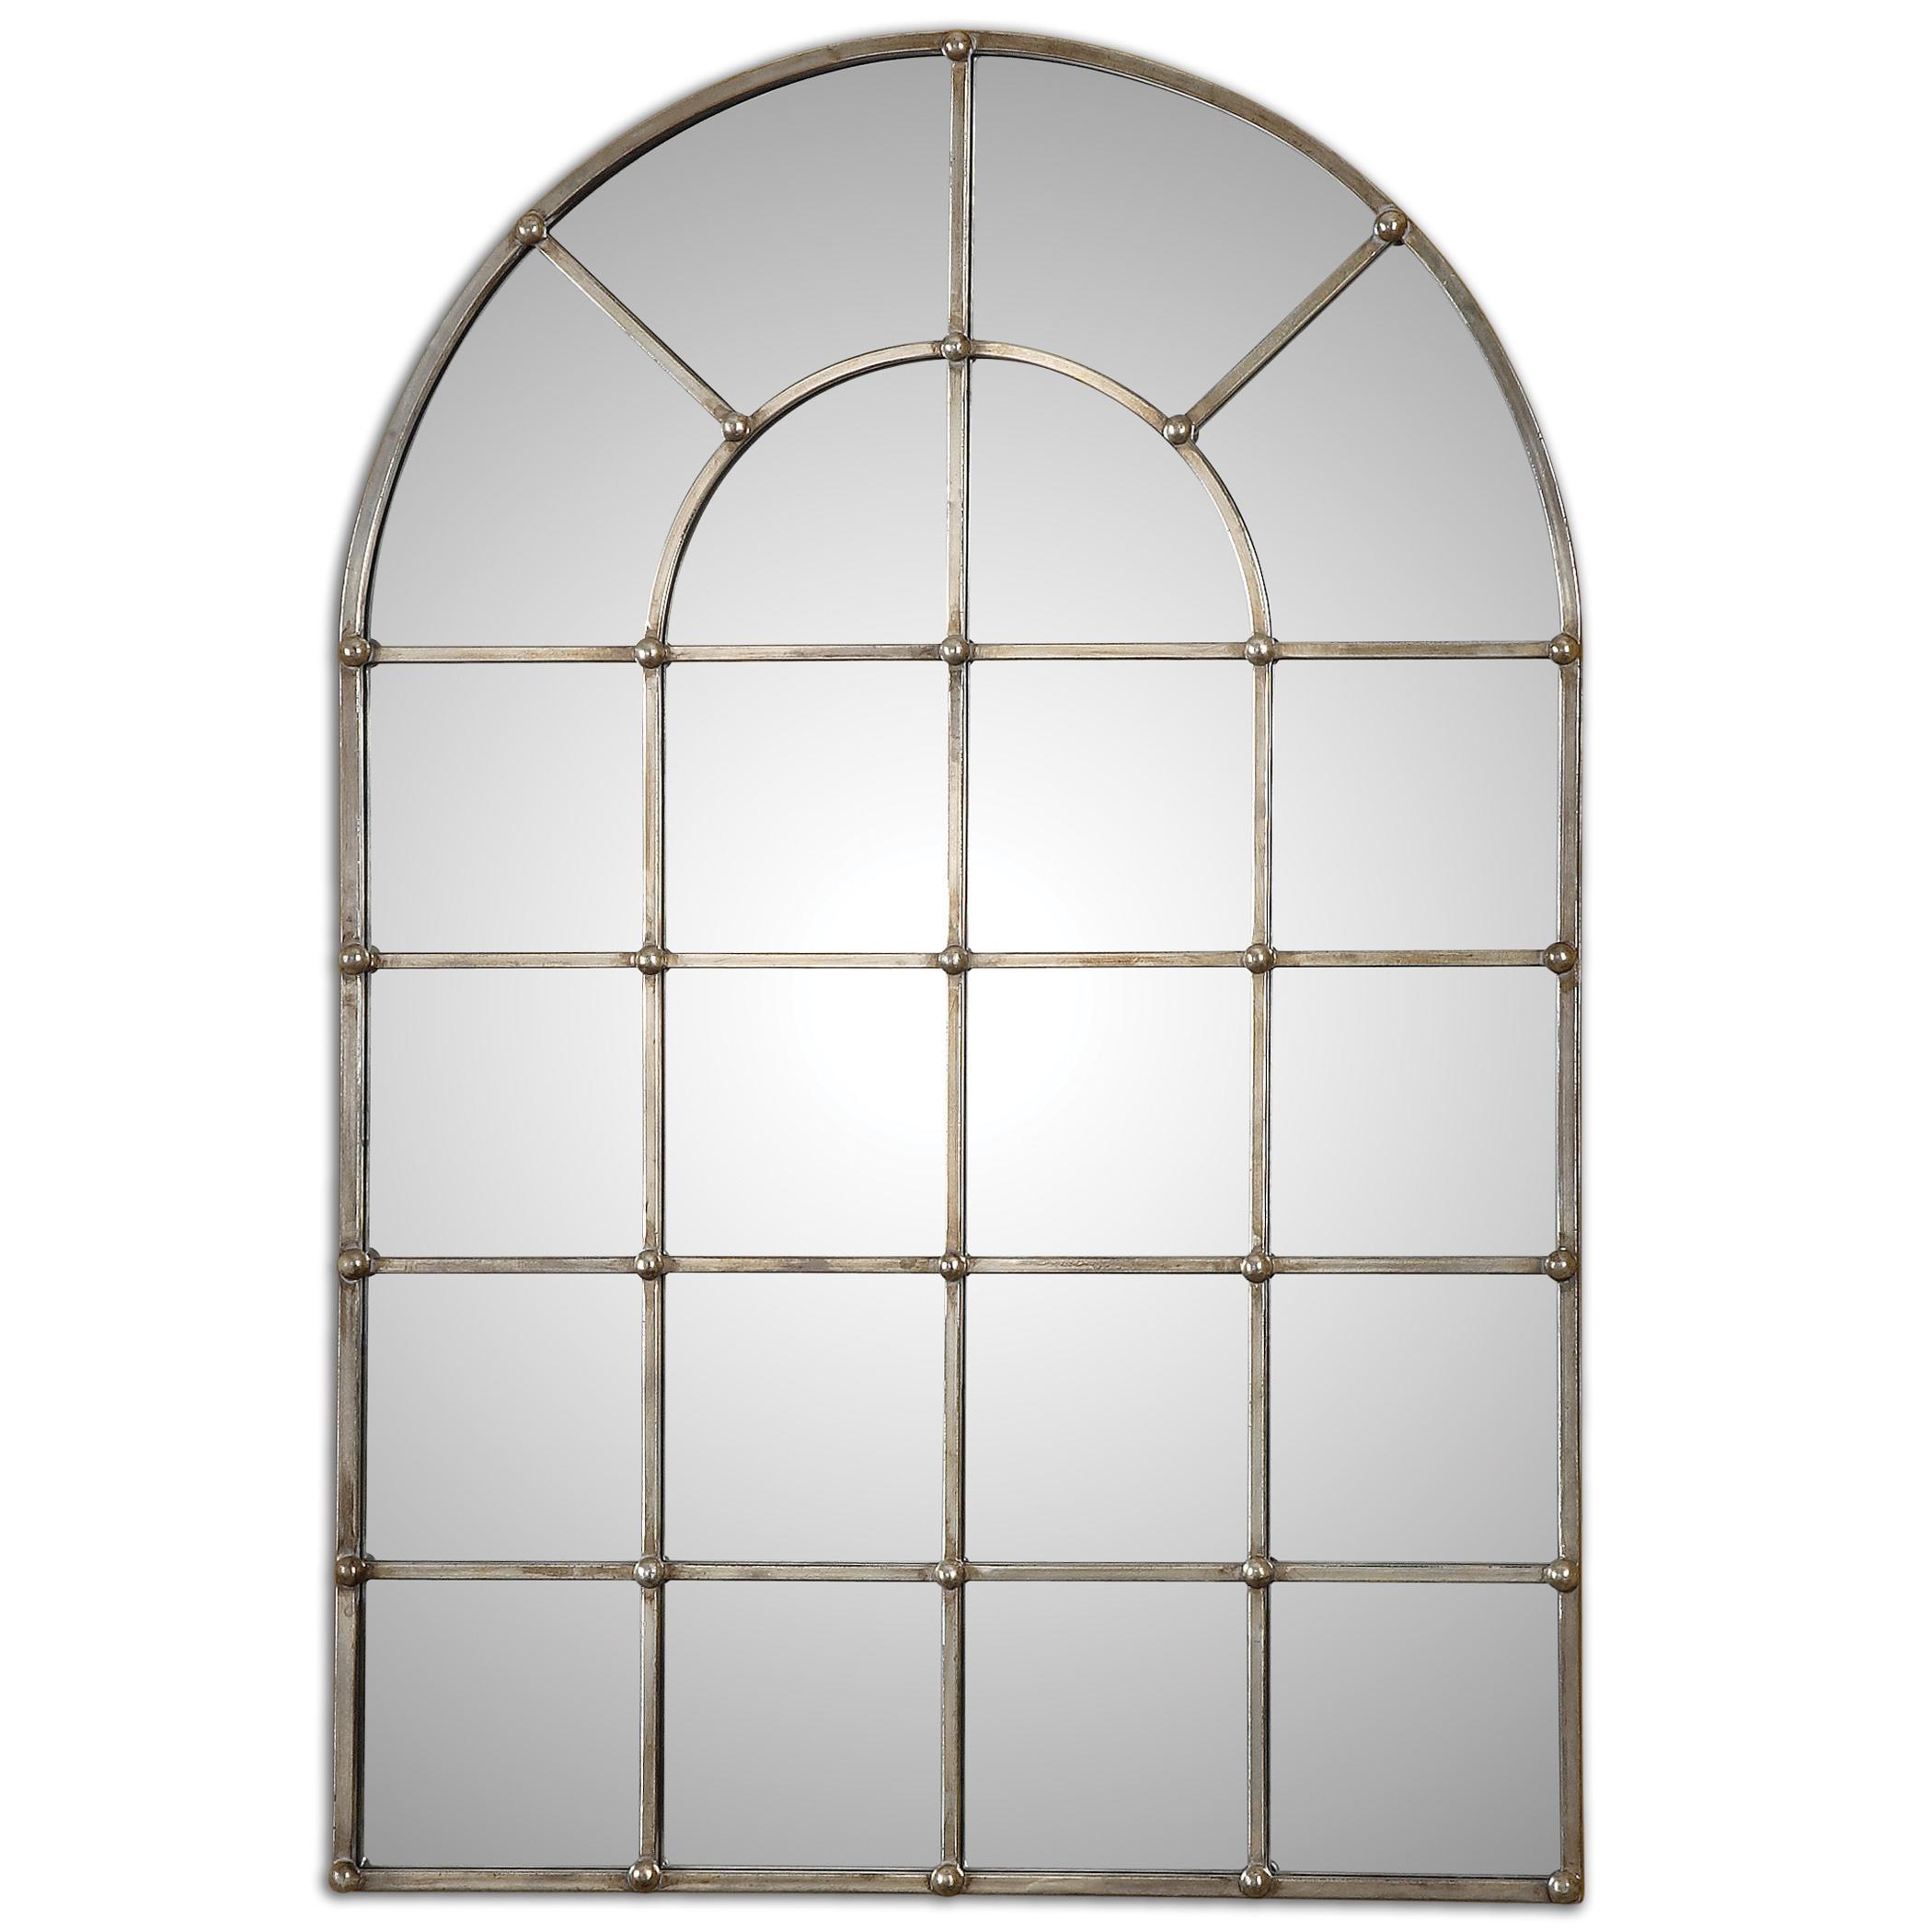 Uttermost Mirrors Barwell Arch Window Mirror - Item Number: 12875